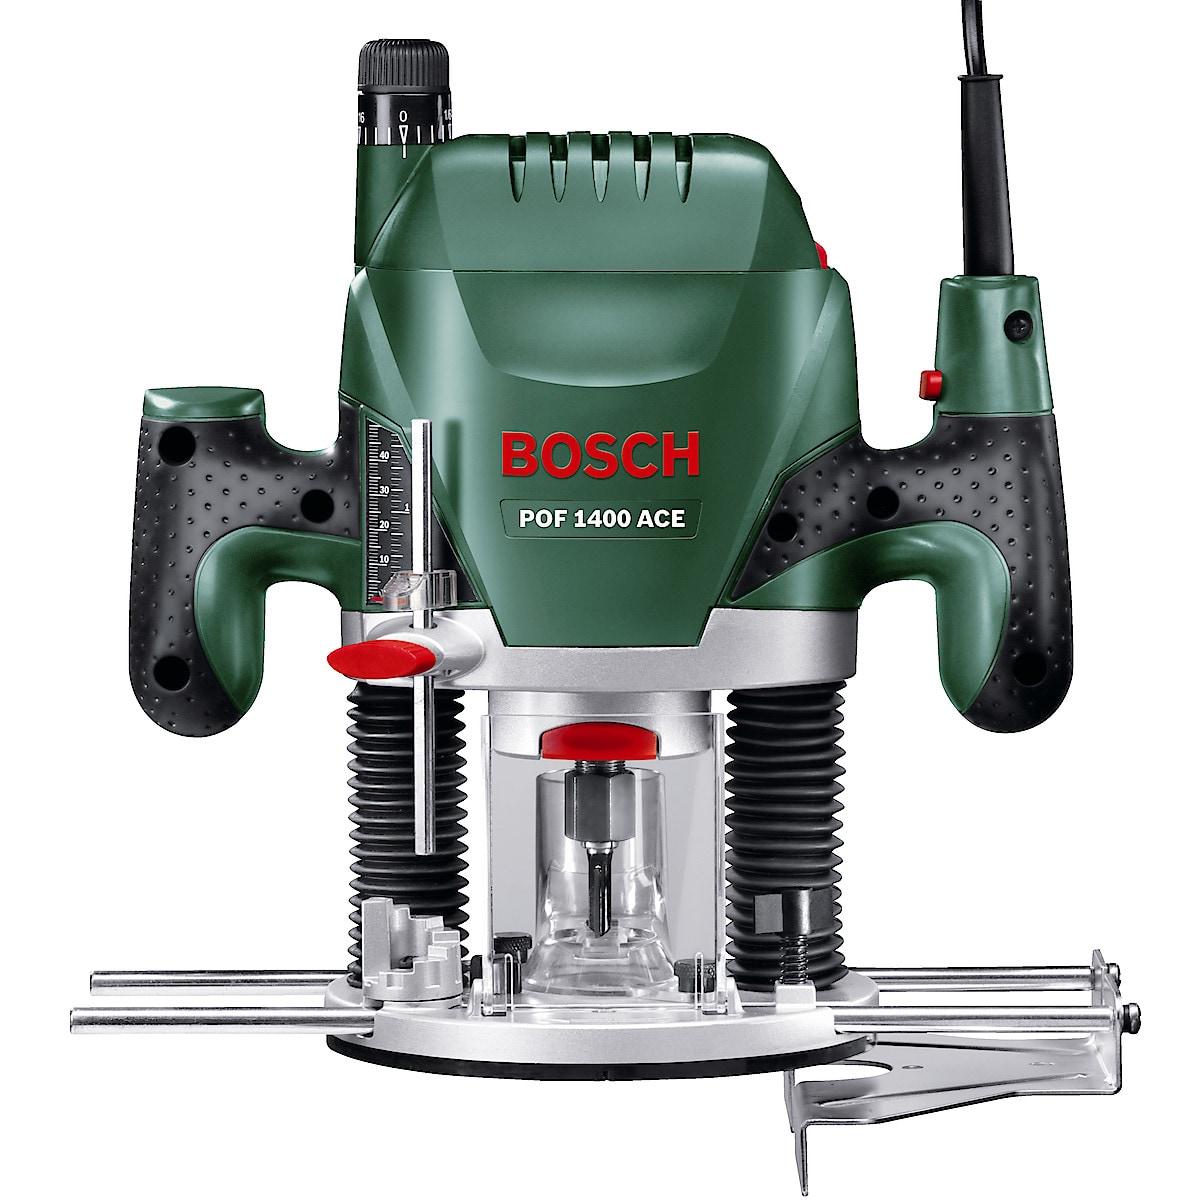 Käsiyläjyrsin Bosch POF 1400 ACE,